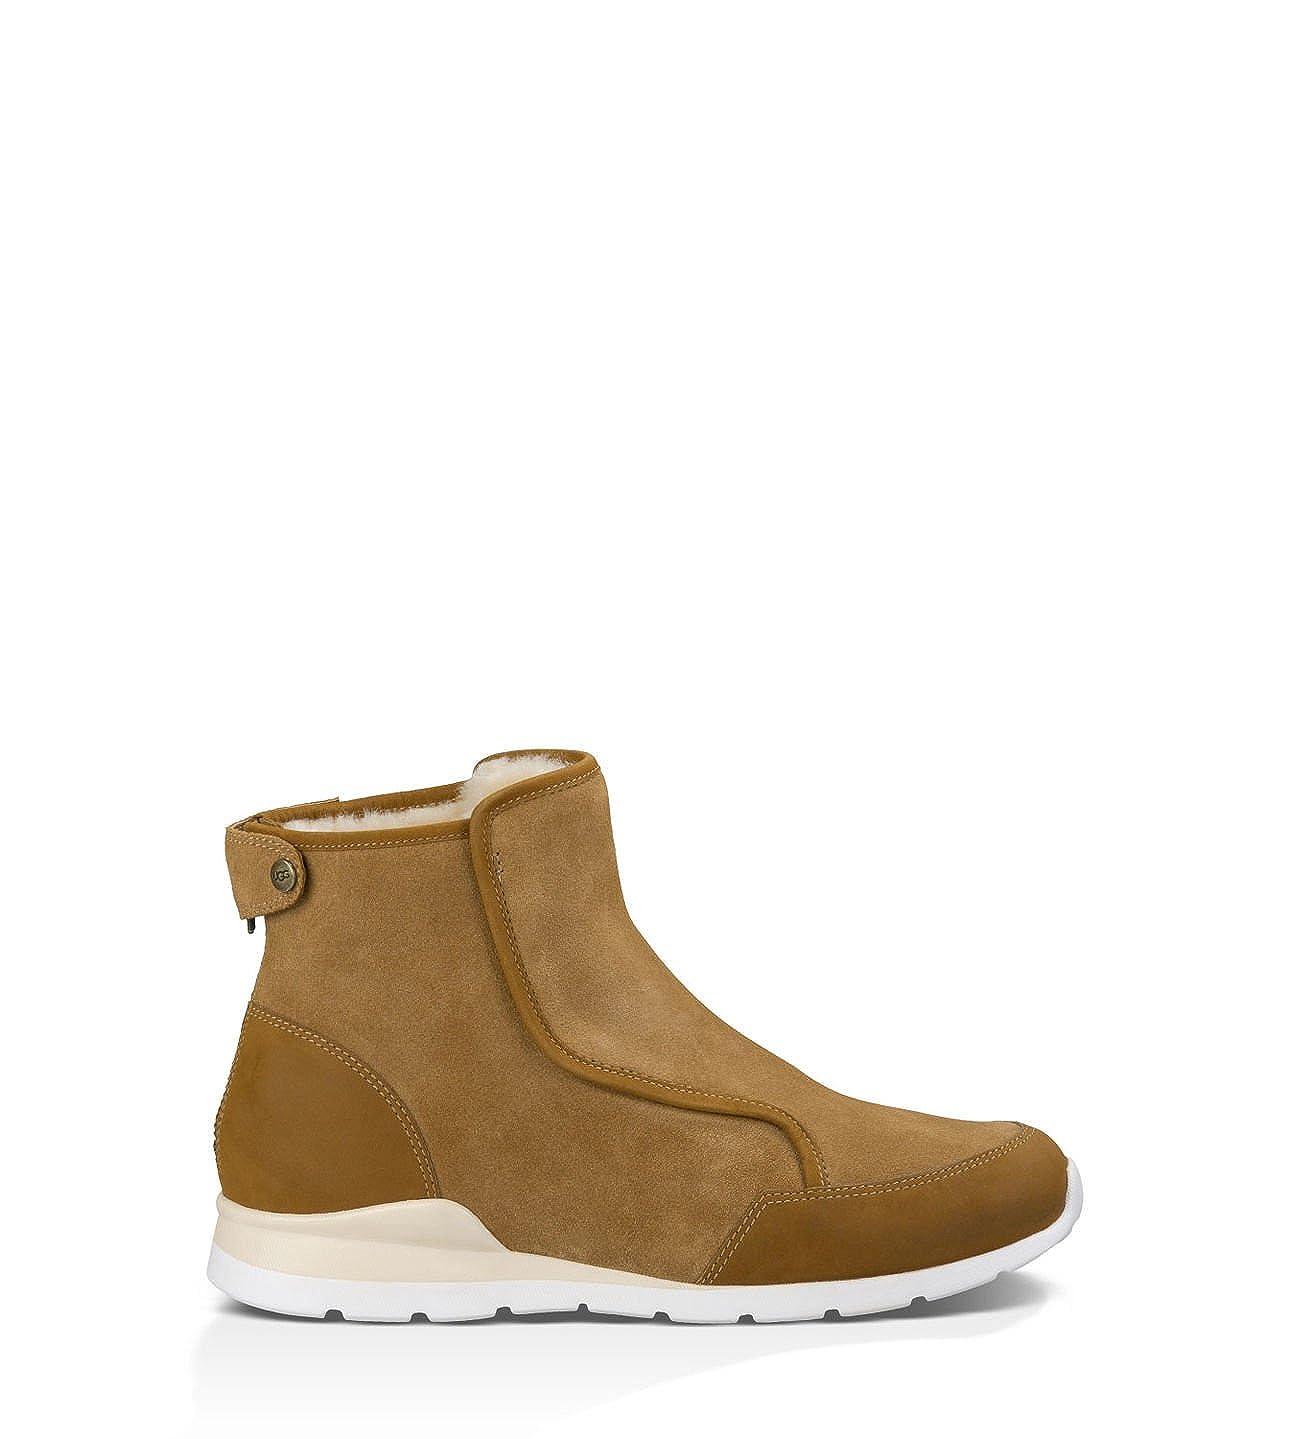 b50852f7240 UGG Women's Laurelle Black Leather Boot: Amazon.co.uk: Shoes & Bags